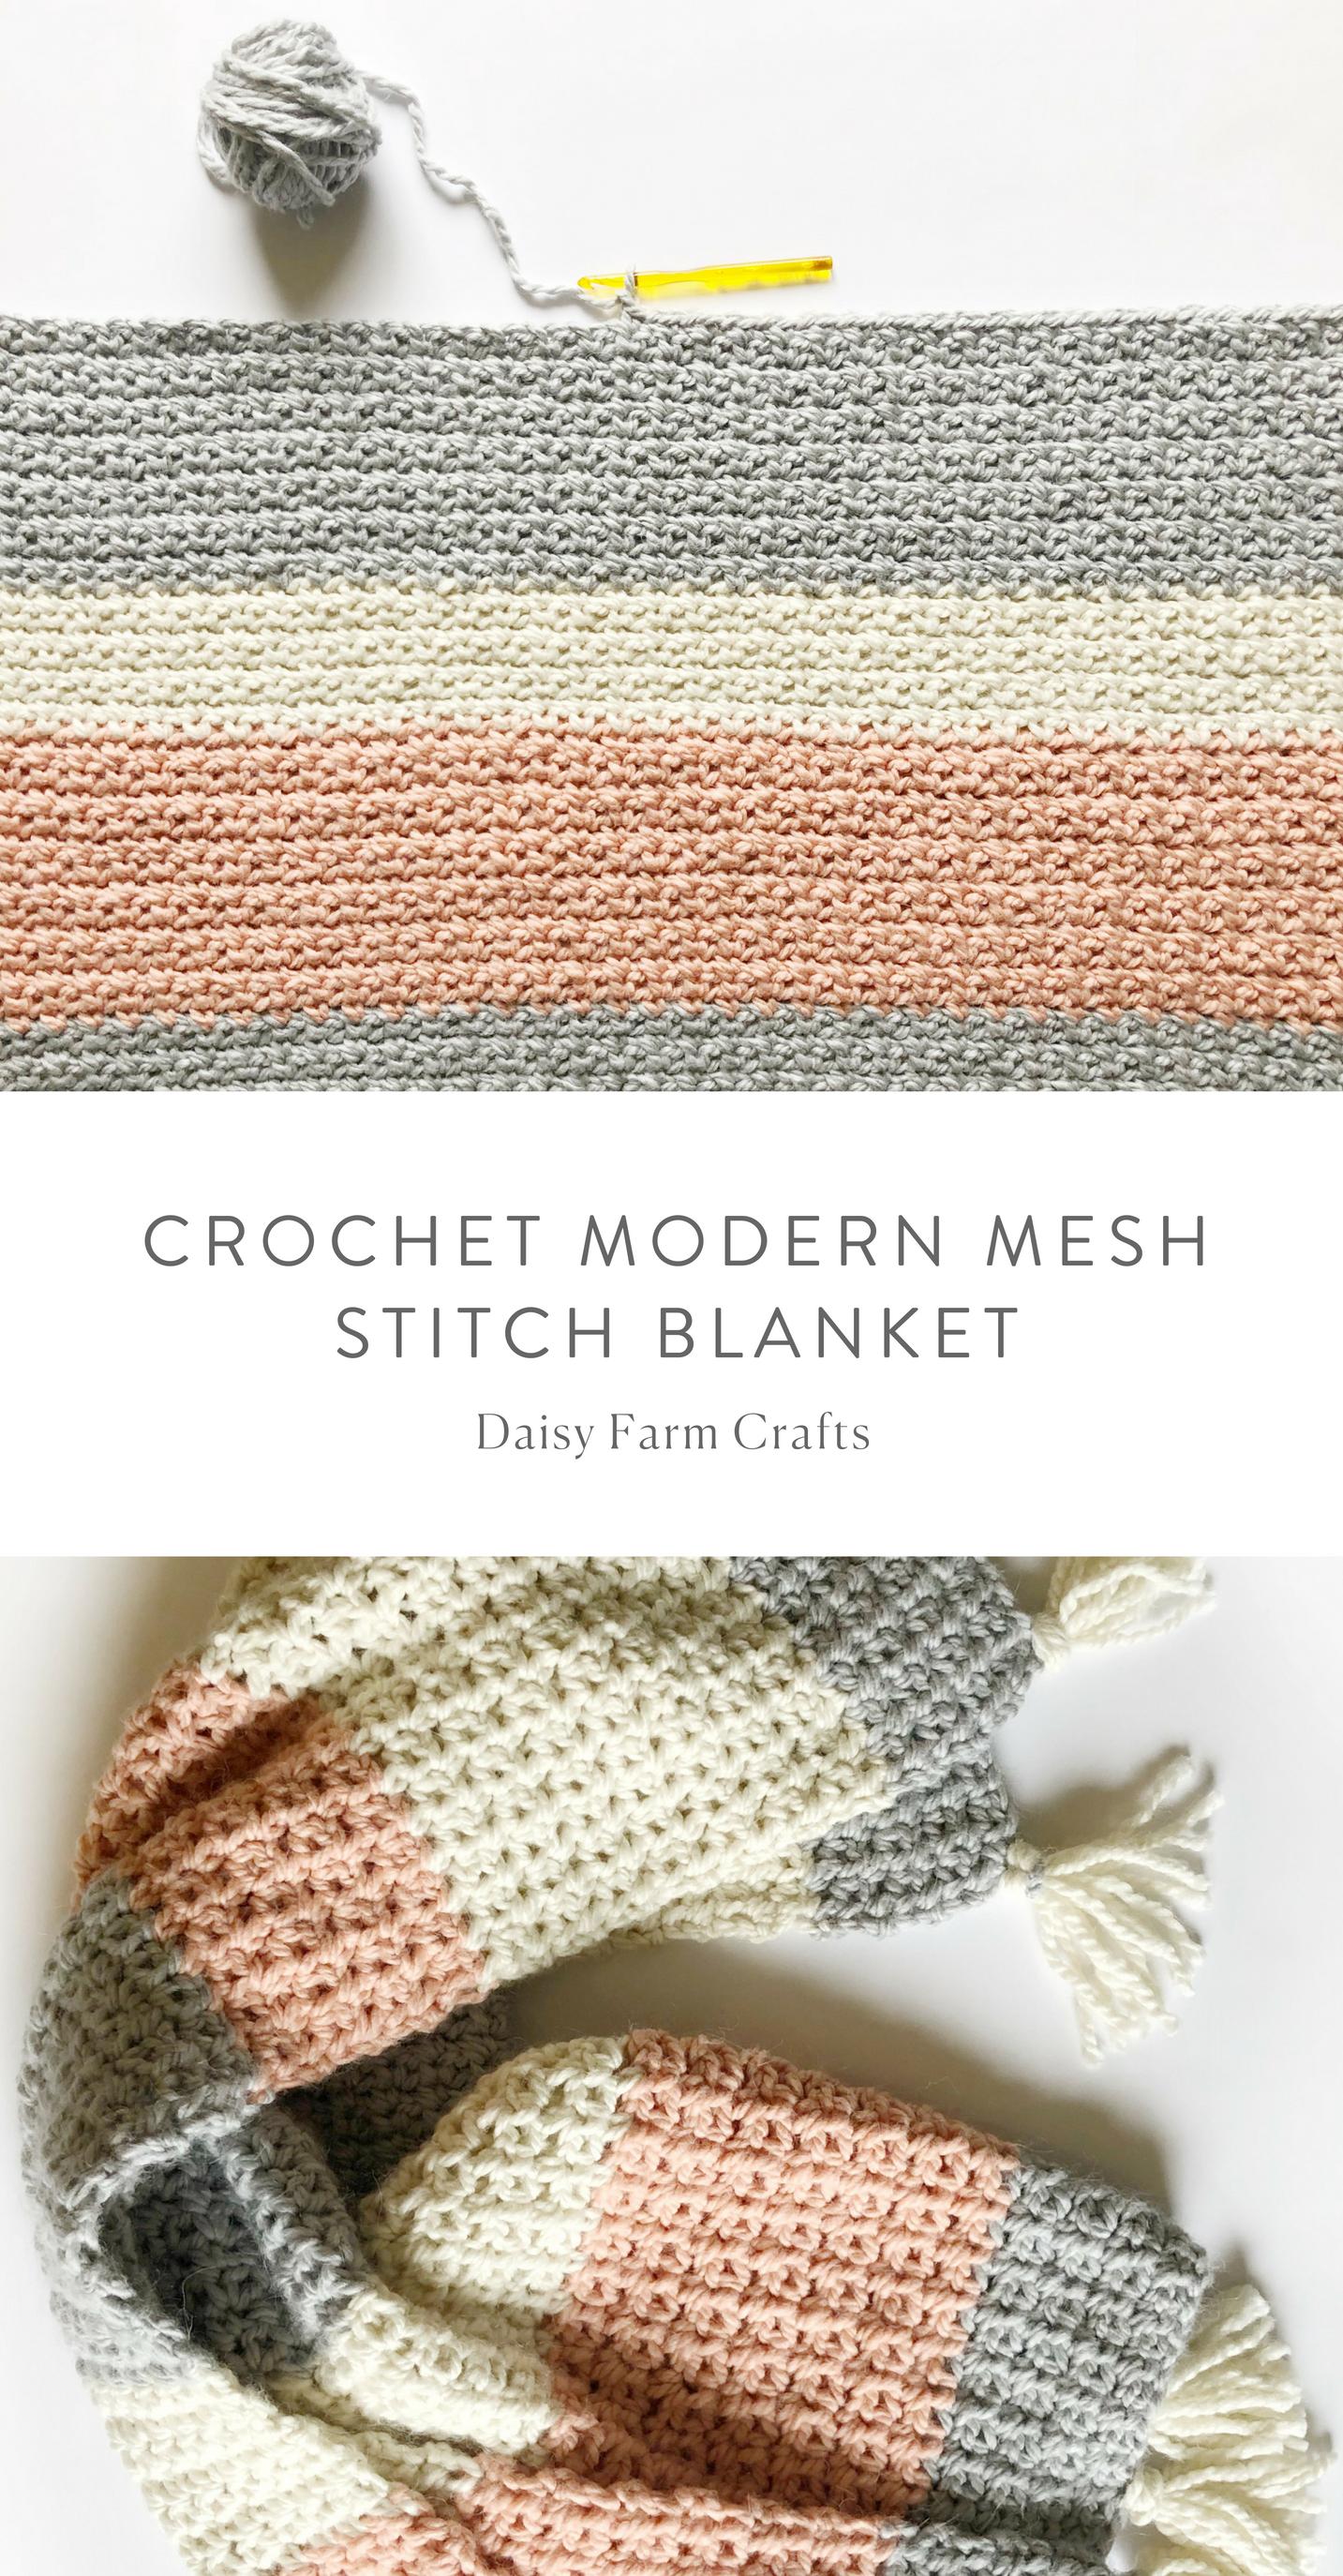 Free Pattern - Crochet Modern Mesh Stitch Blanket #crochet | Crochet ...